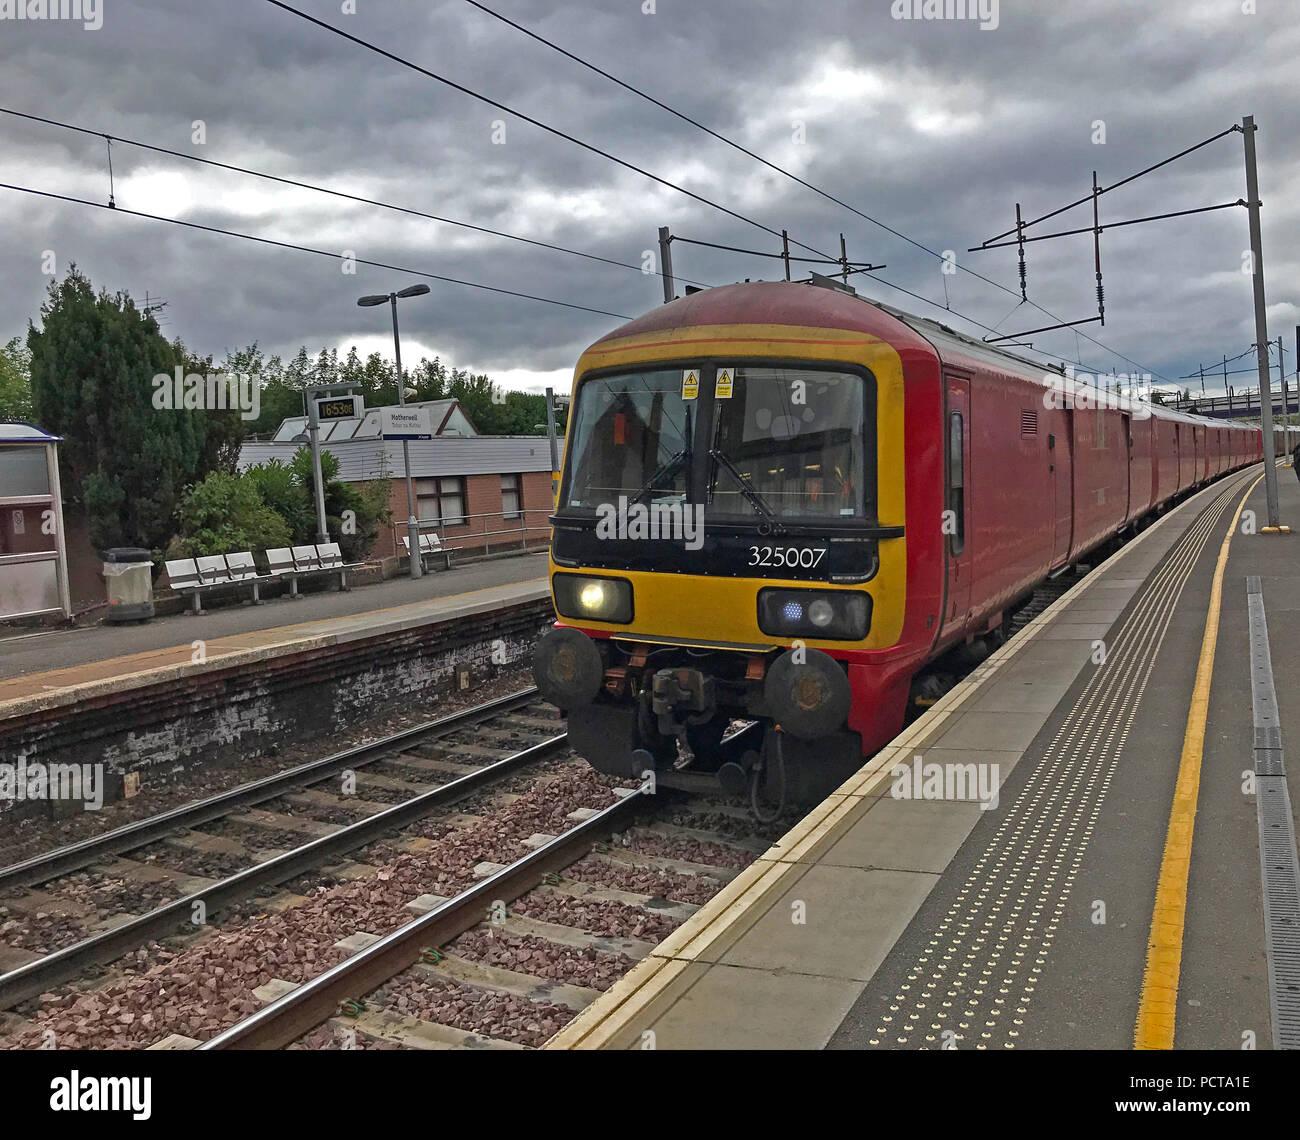 GoTonySmith,@HotpixUK,at,North Lanarkshire,Scotland,UK,Train,Red,325007 royal mail,DB,DB Schenker,Schenker,TOC,train operating Company,class325,Class 325,BR,British Rail,mail train,sorting,office,WCML,West Coast Main Line,post train,postal train,British Rail Class 325,EMU,Class 319 EMU,electric multiple unit,Overhead,lines,Class350,class 350,TOPS,numbers,oleo buffers,Class 325 fleet,DB Cargo UK